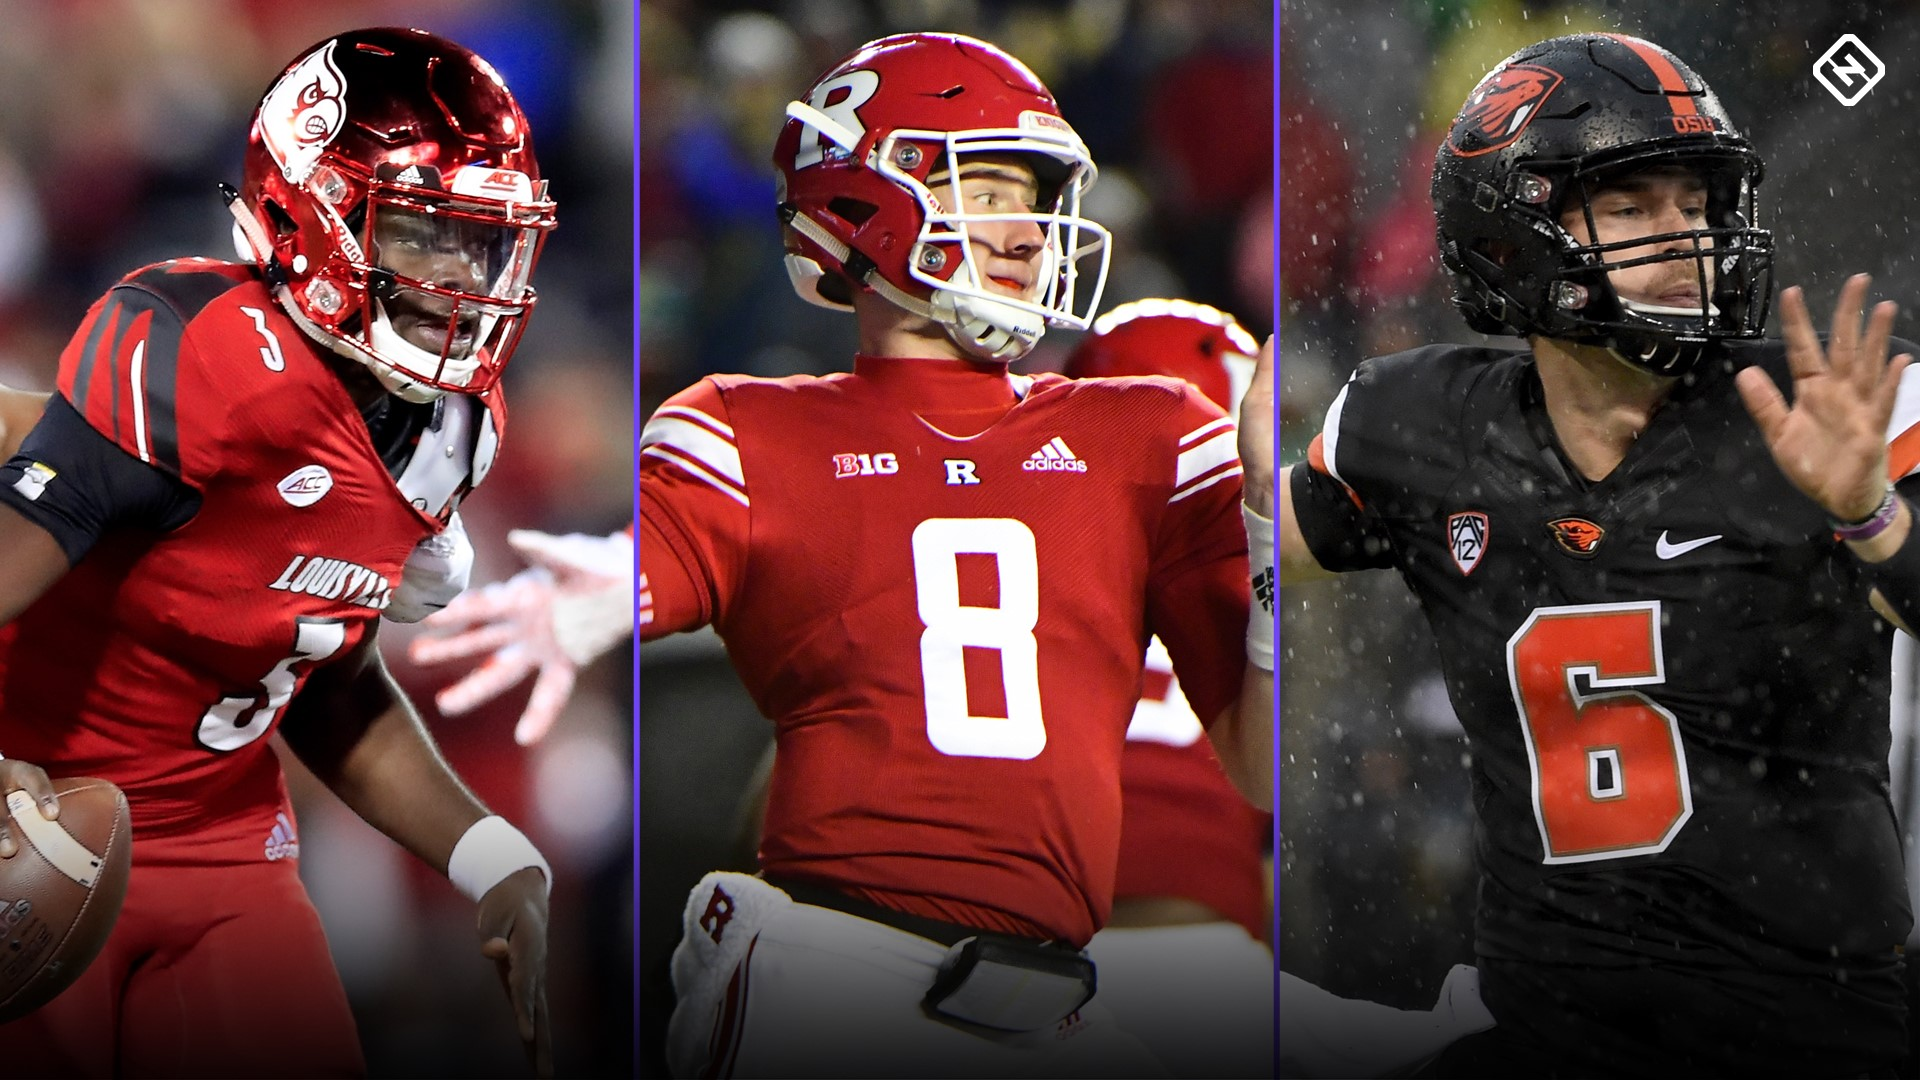 The Bittersweet 16 Meet The Worst Power 5 Teams In College Football In 2019 Sporting News